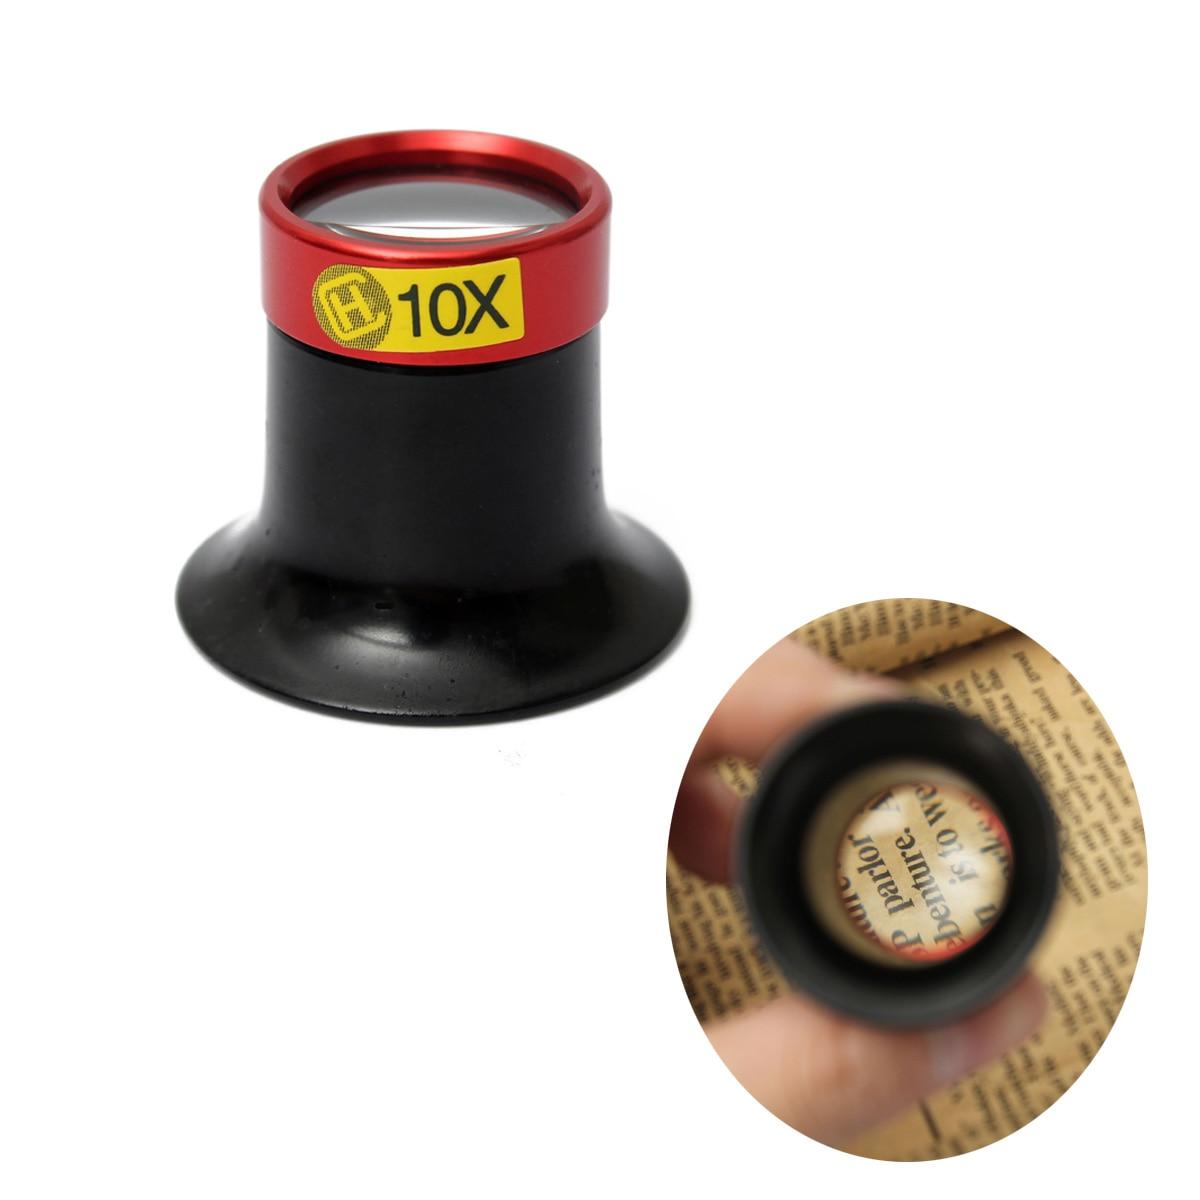 1 Pcs 10x Monocular Lupe Lupe Linse Lupe Auge Glas Juwelier Uhr Reparatur Werkzeug Haltegriff Tragbare Aluminium Legierung